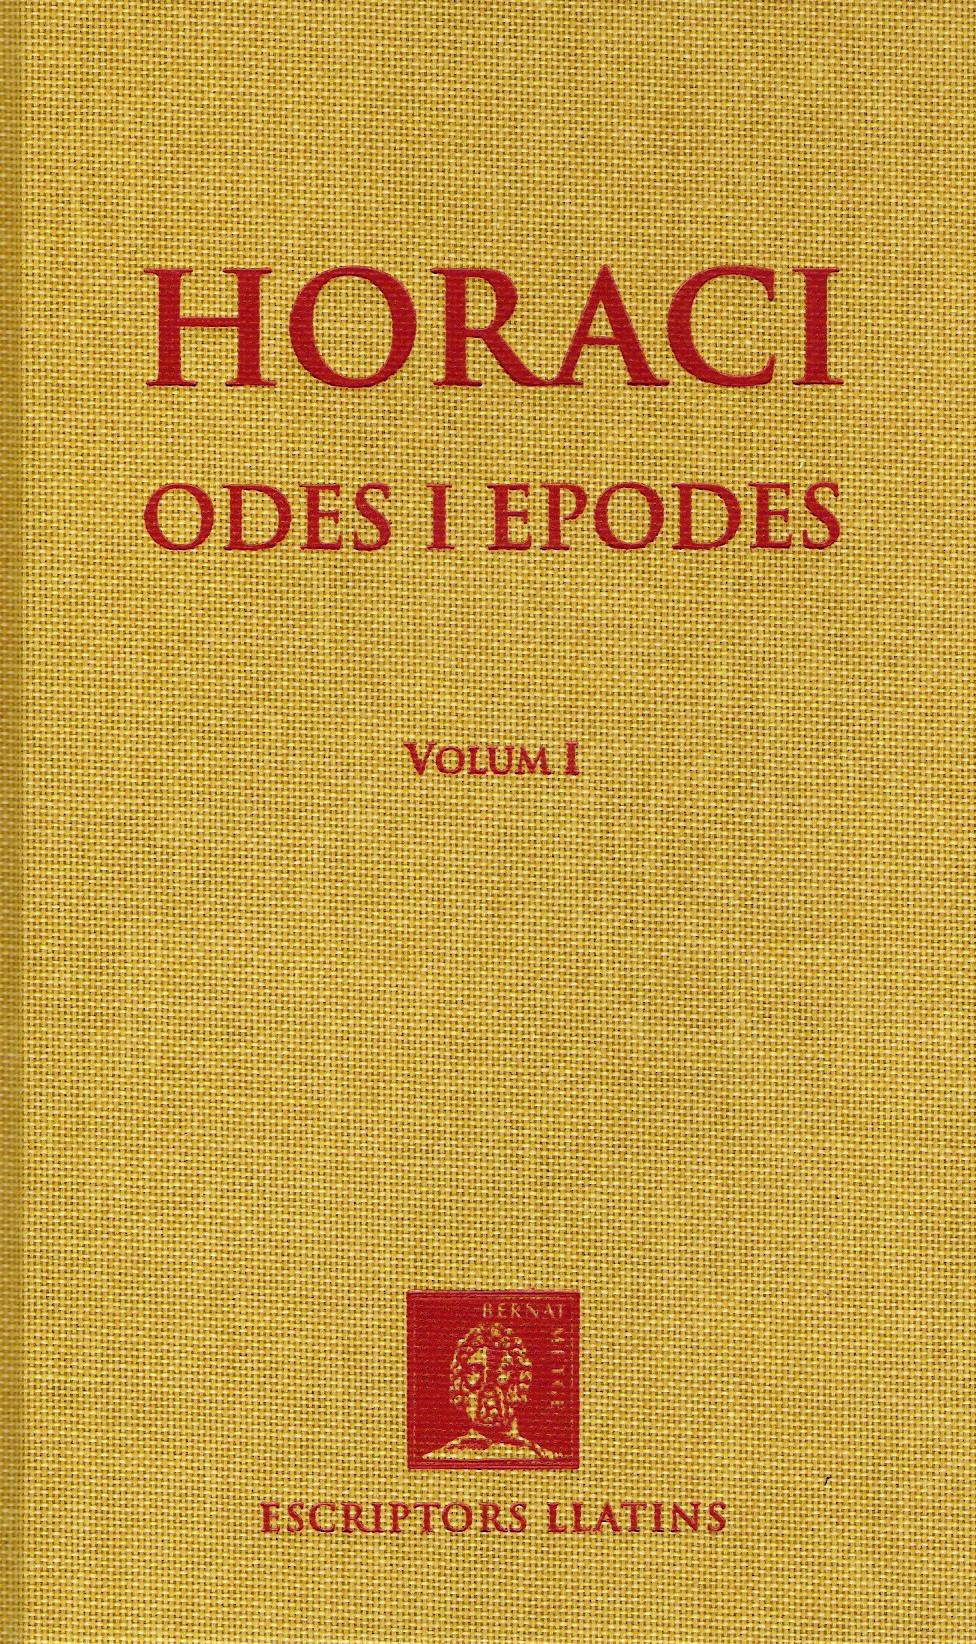 Odes i Epodes